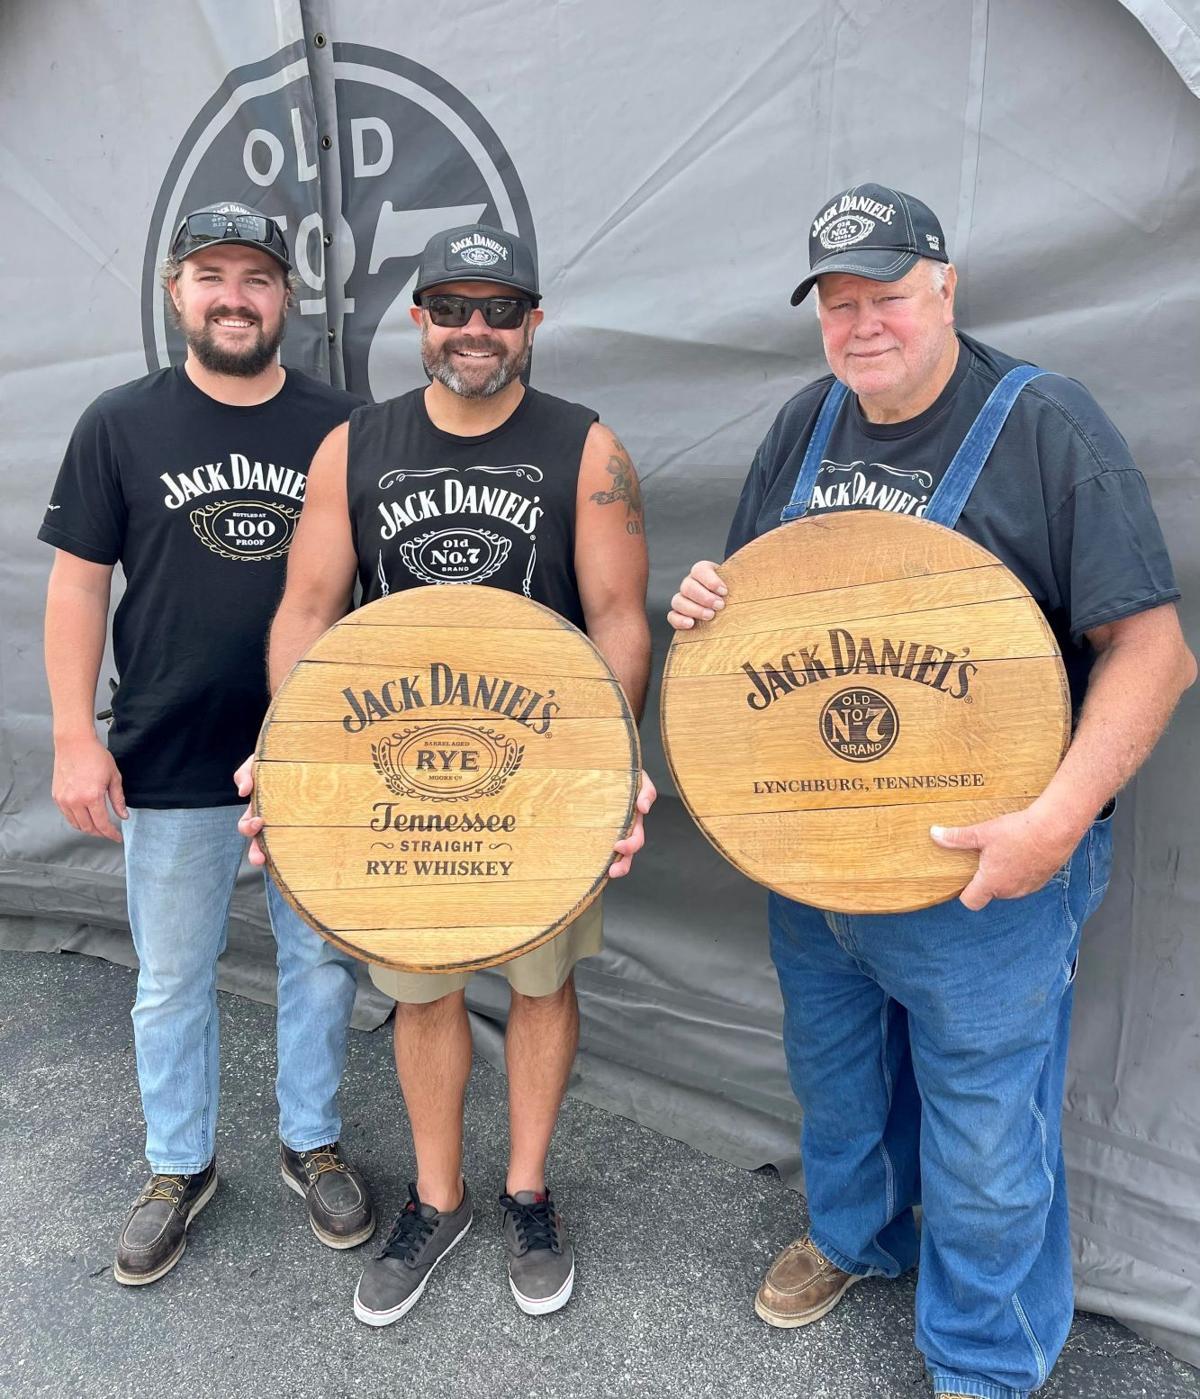 Jack Daniel's tent team